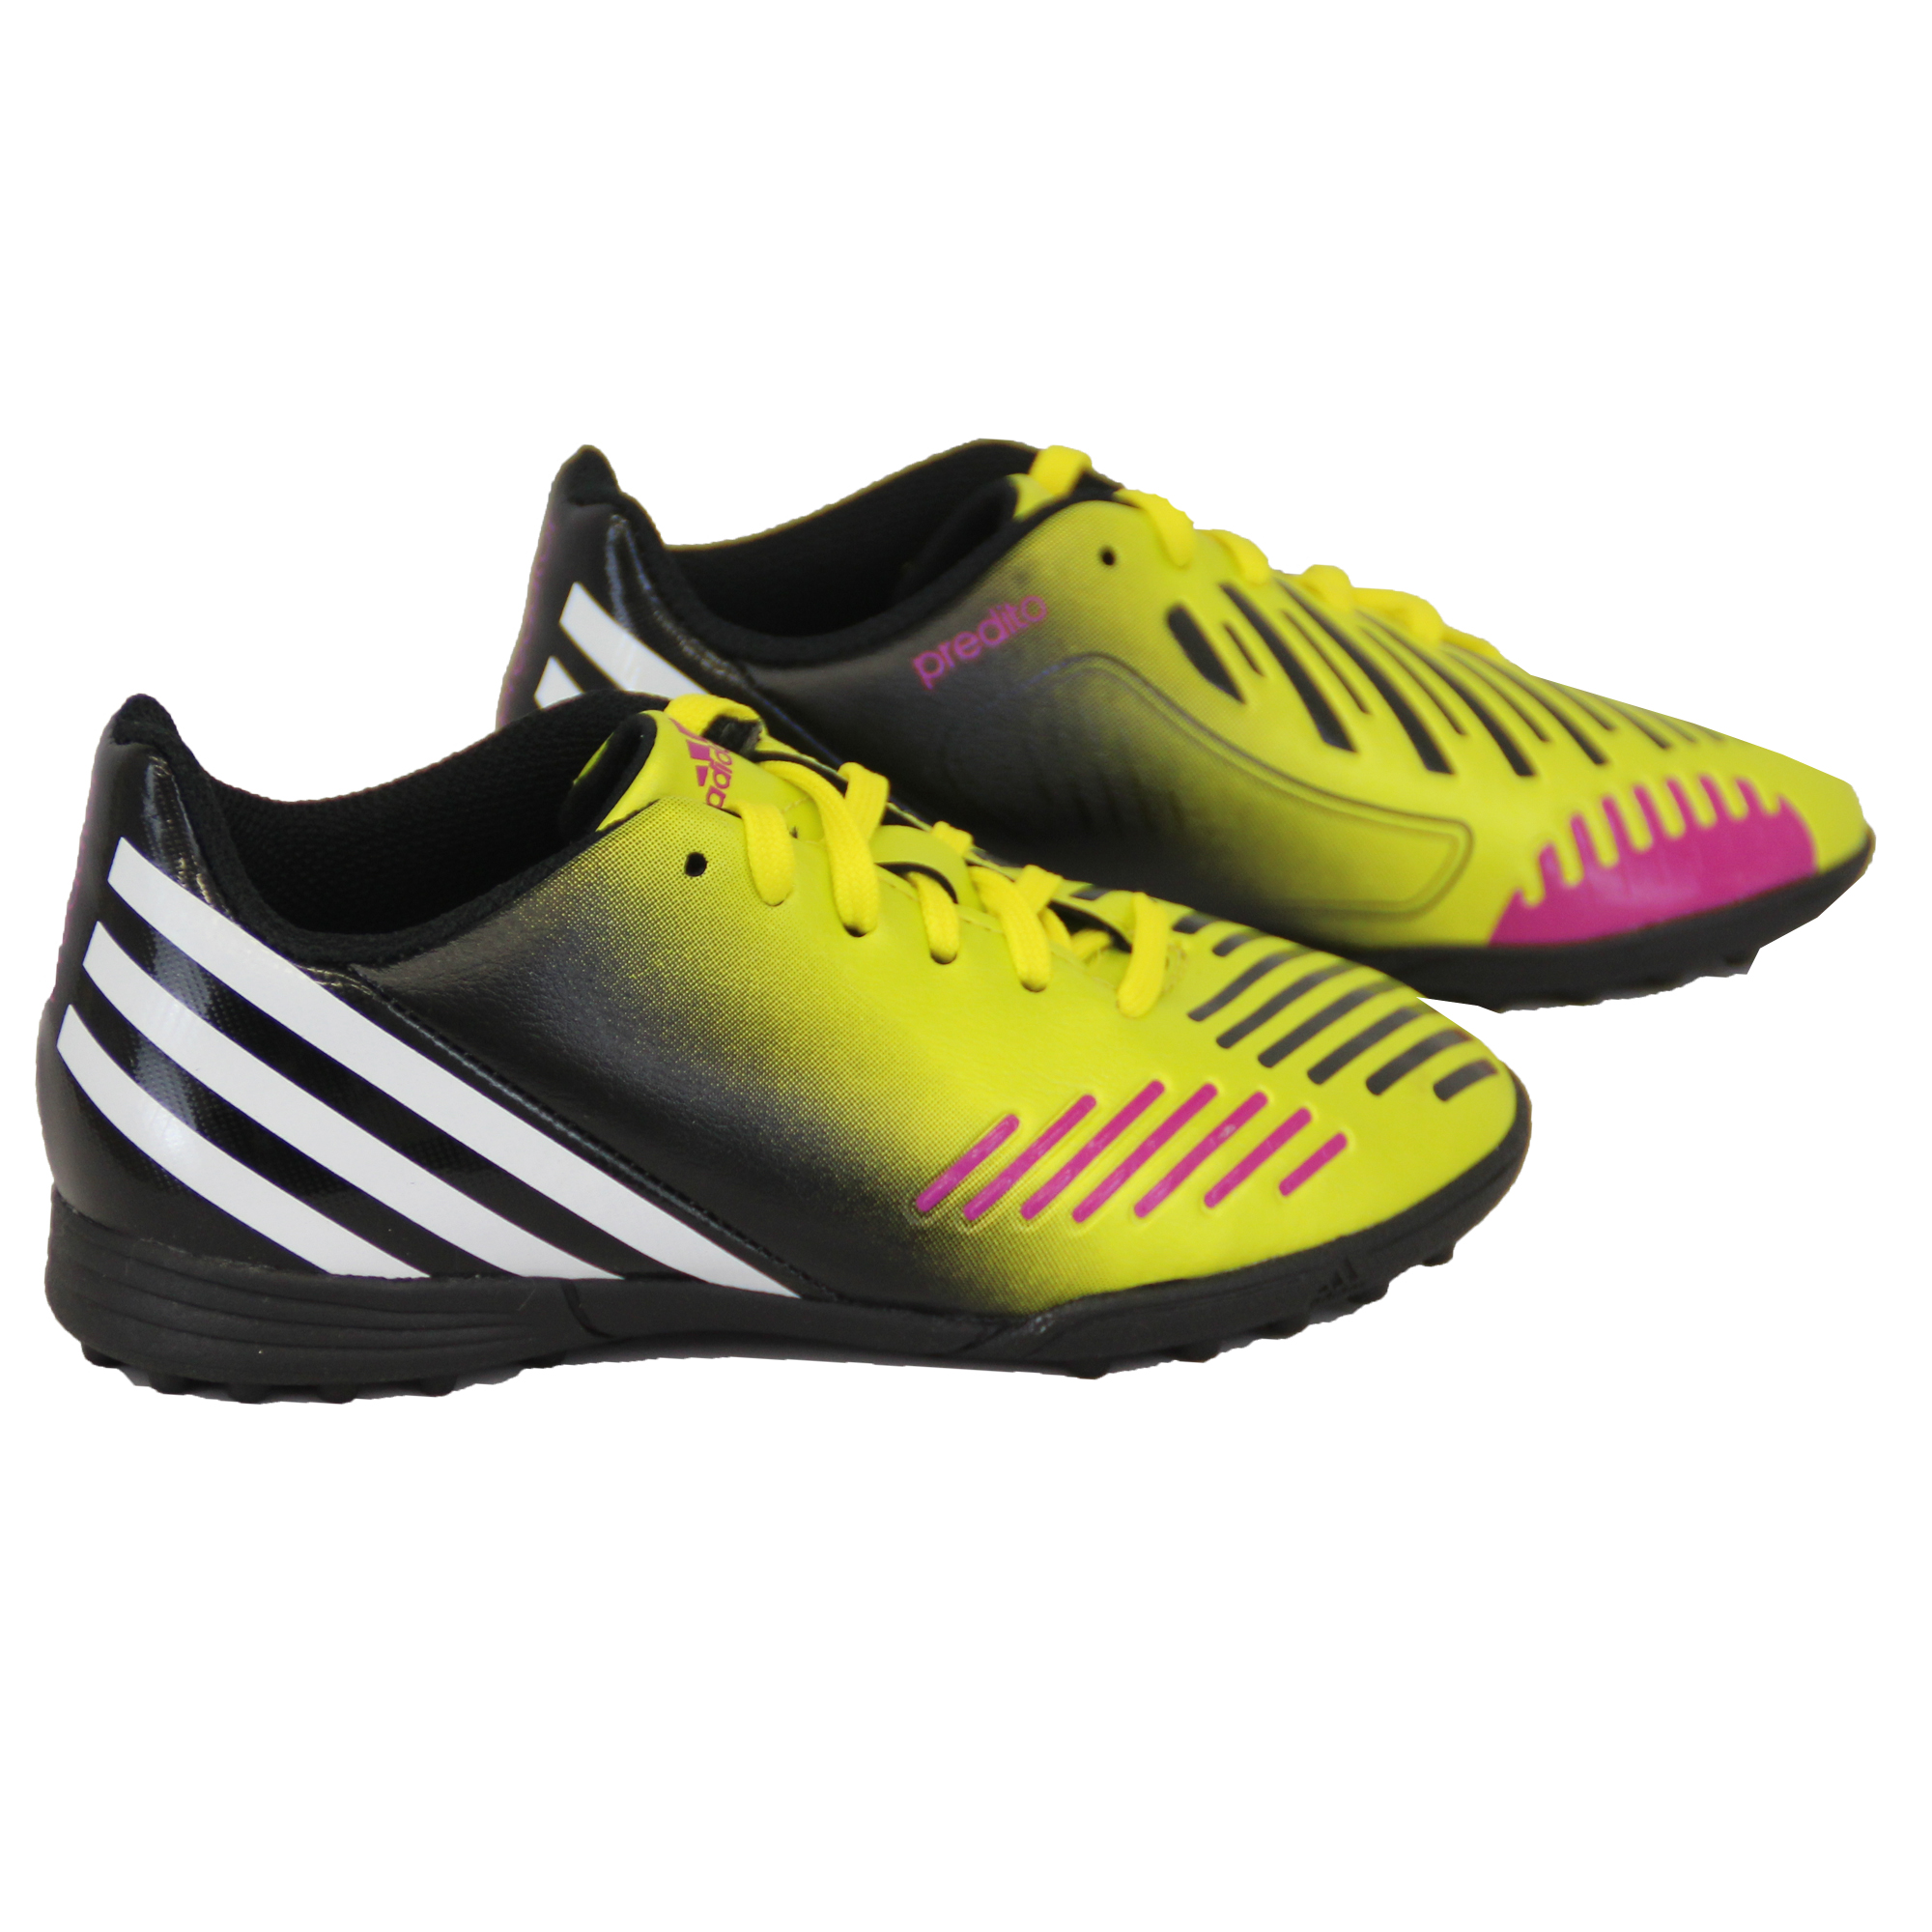 Astro Turf Football Shoes Uk